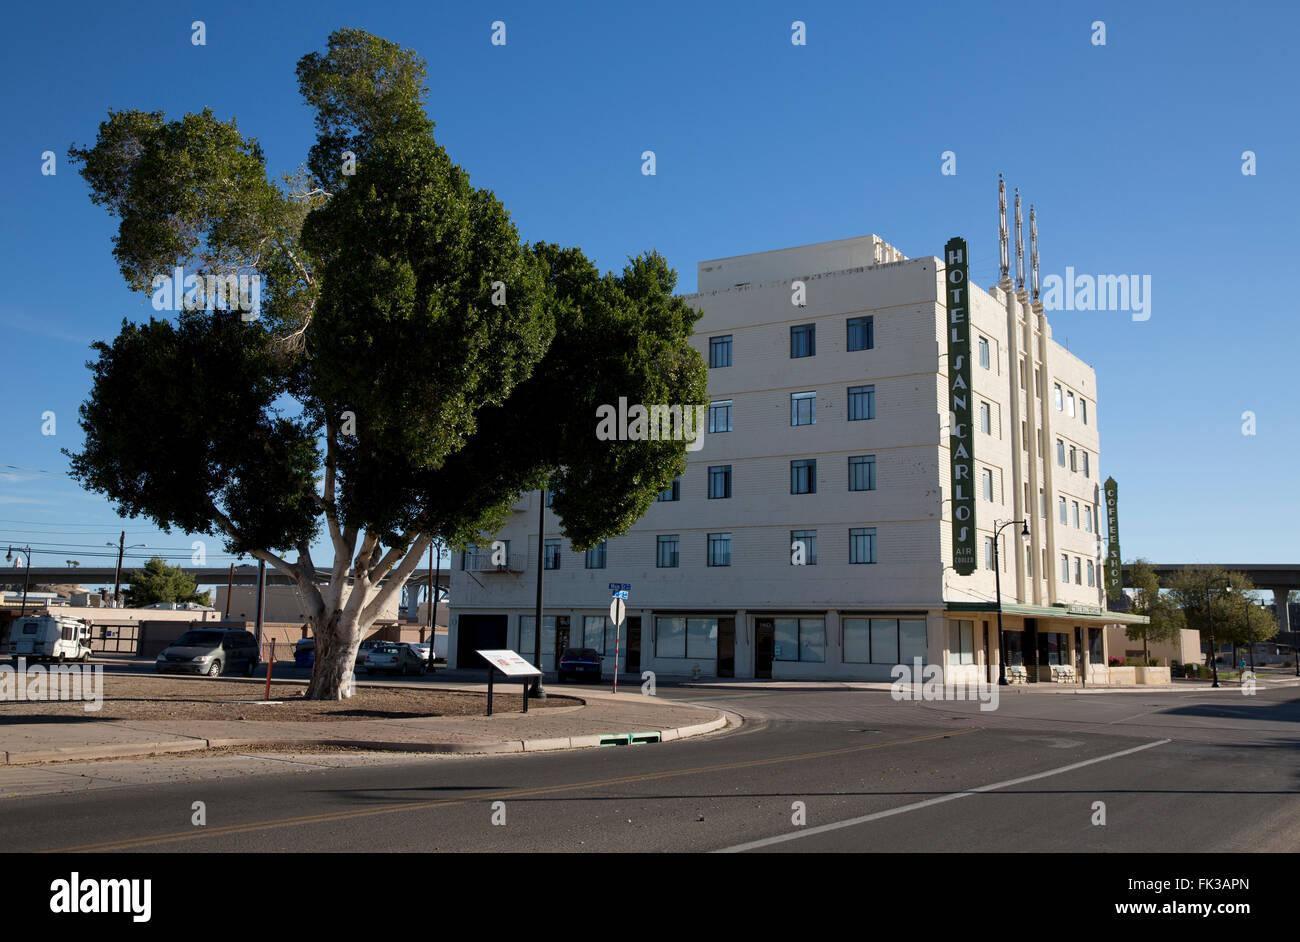 hotel san carlos yuma arizona usa stock photo 97804637. Black Bedroom Furniture Sets. Home Design Ideas